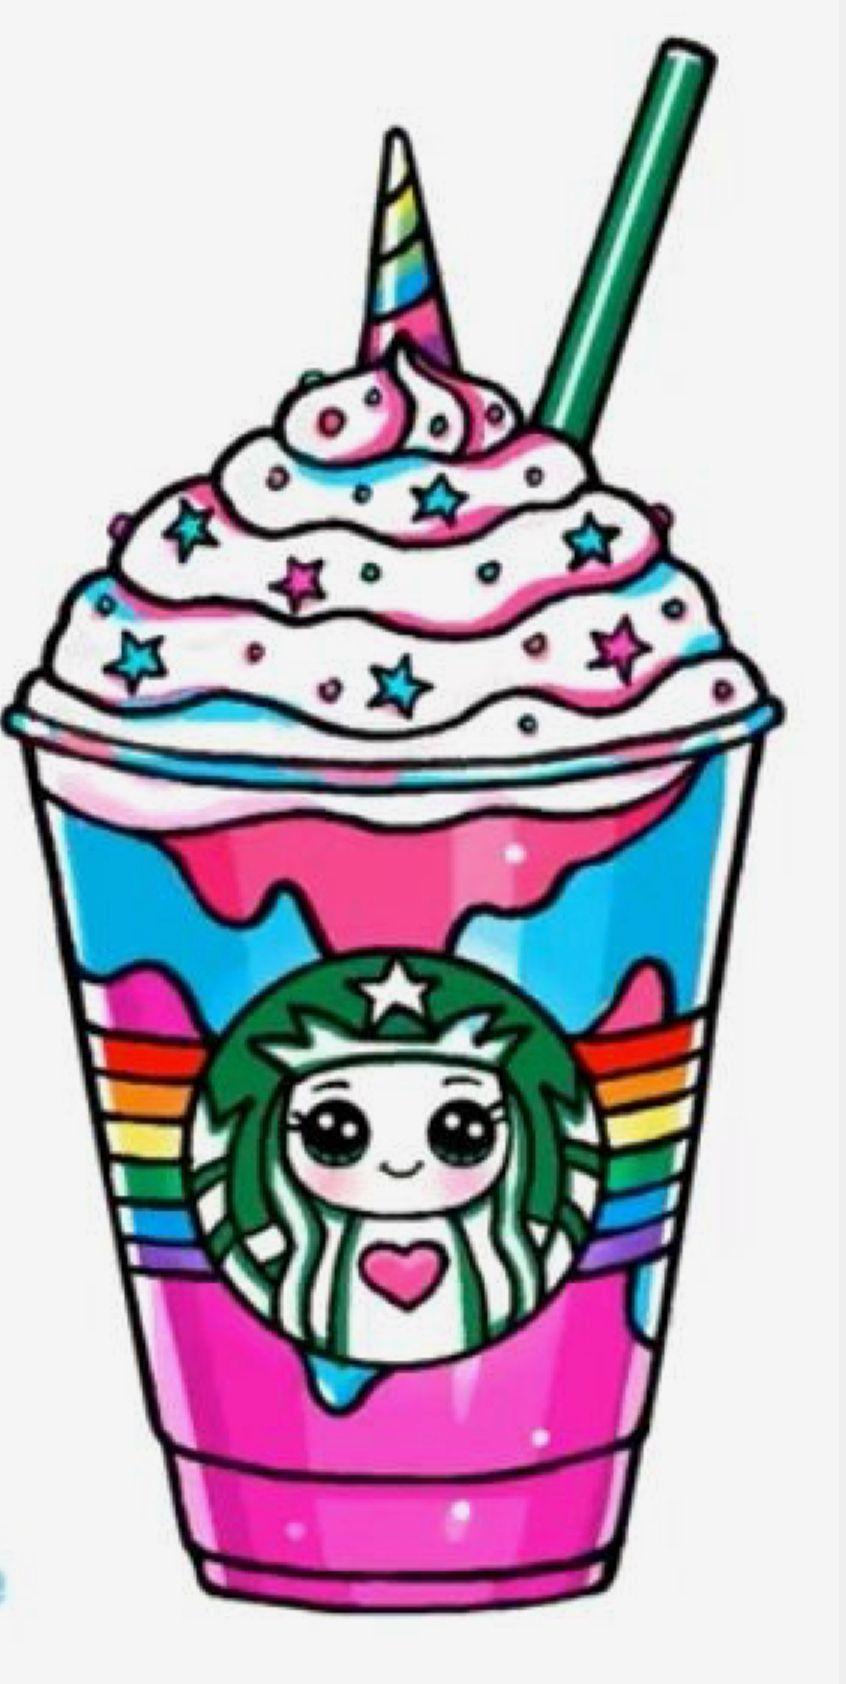 Starbucks Cute Wallpaper 31 Wallpaper Collections Dibujos